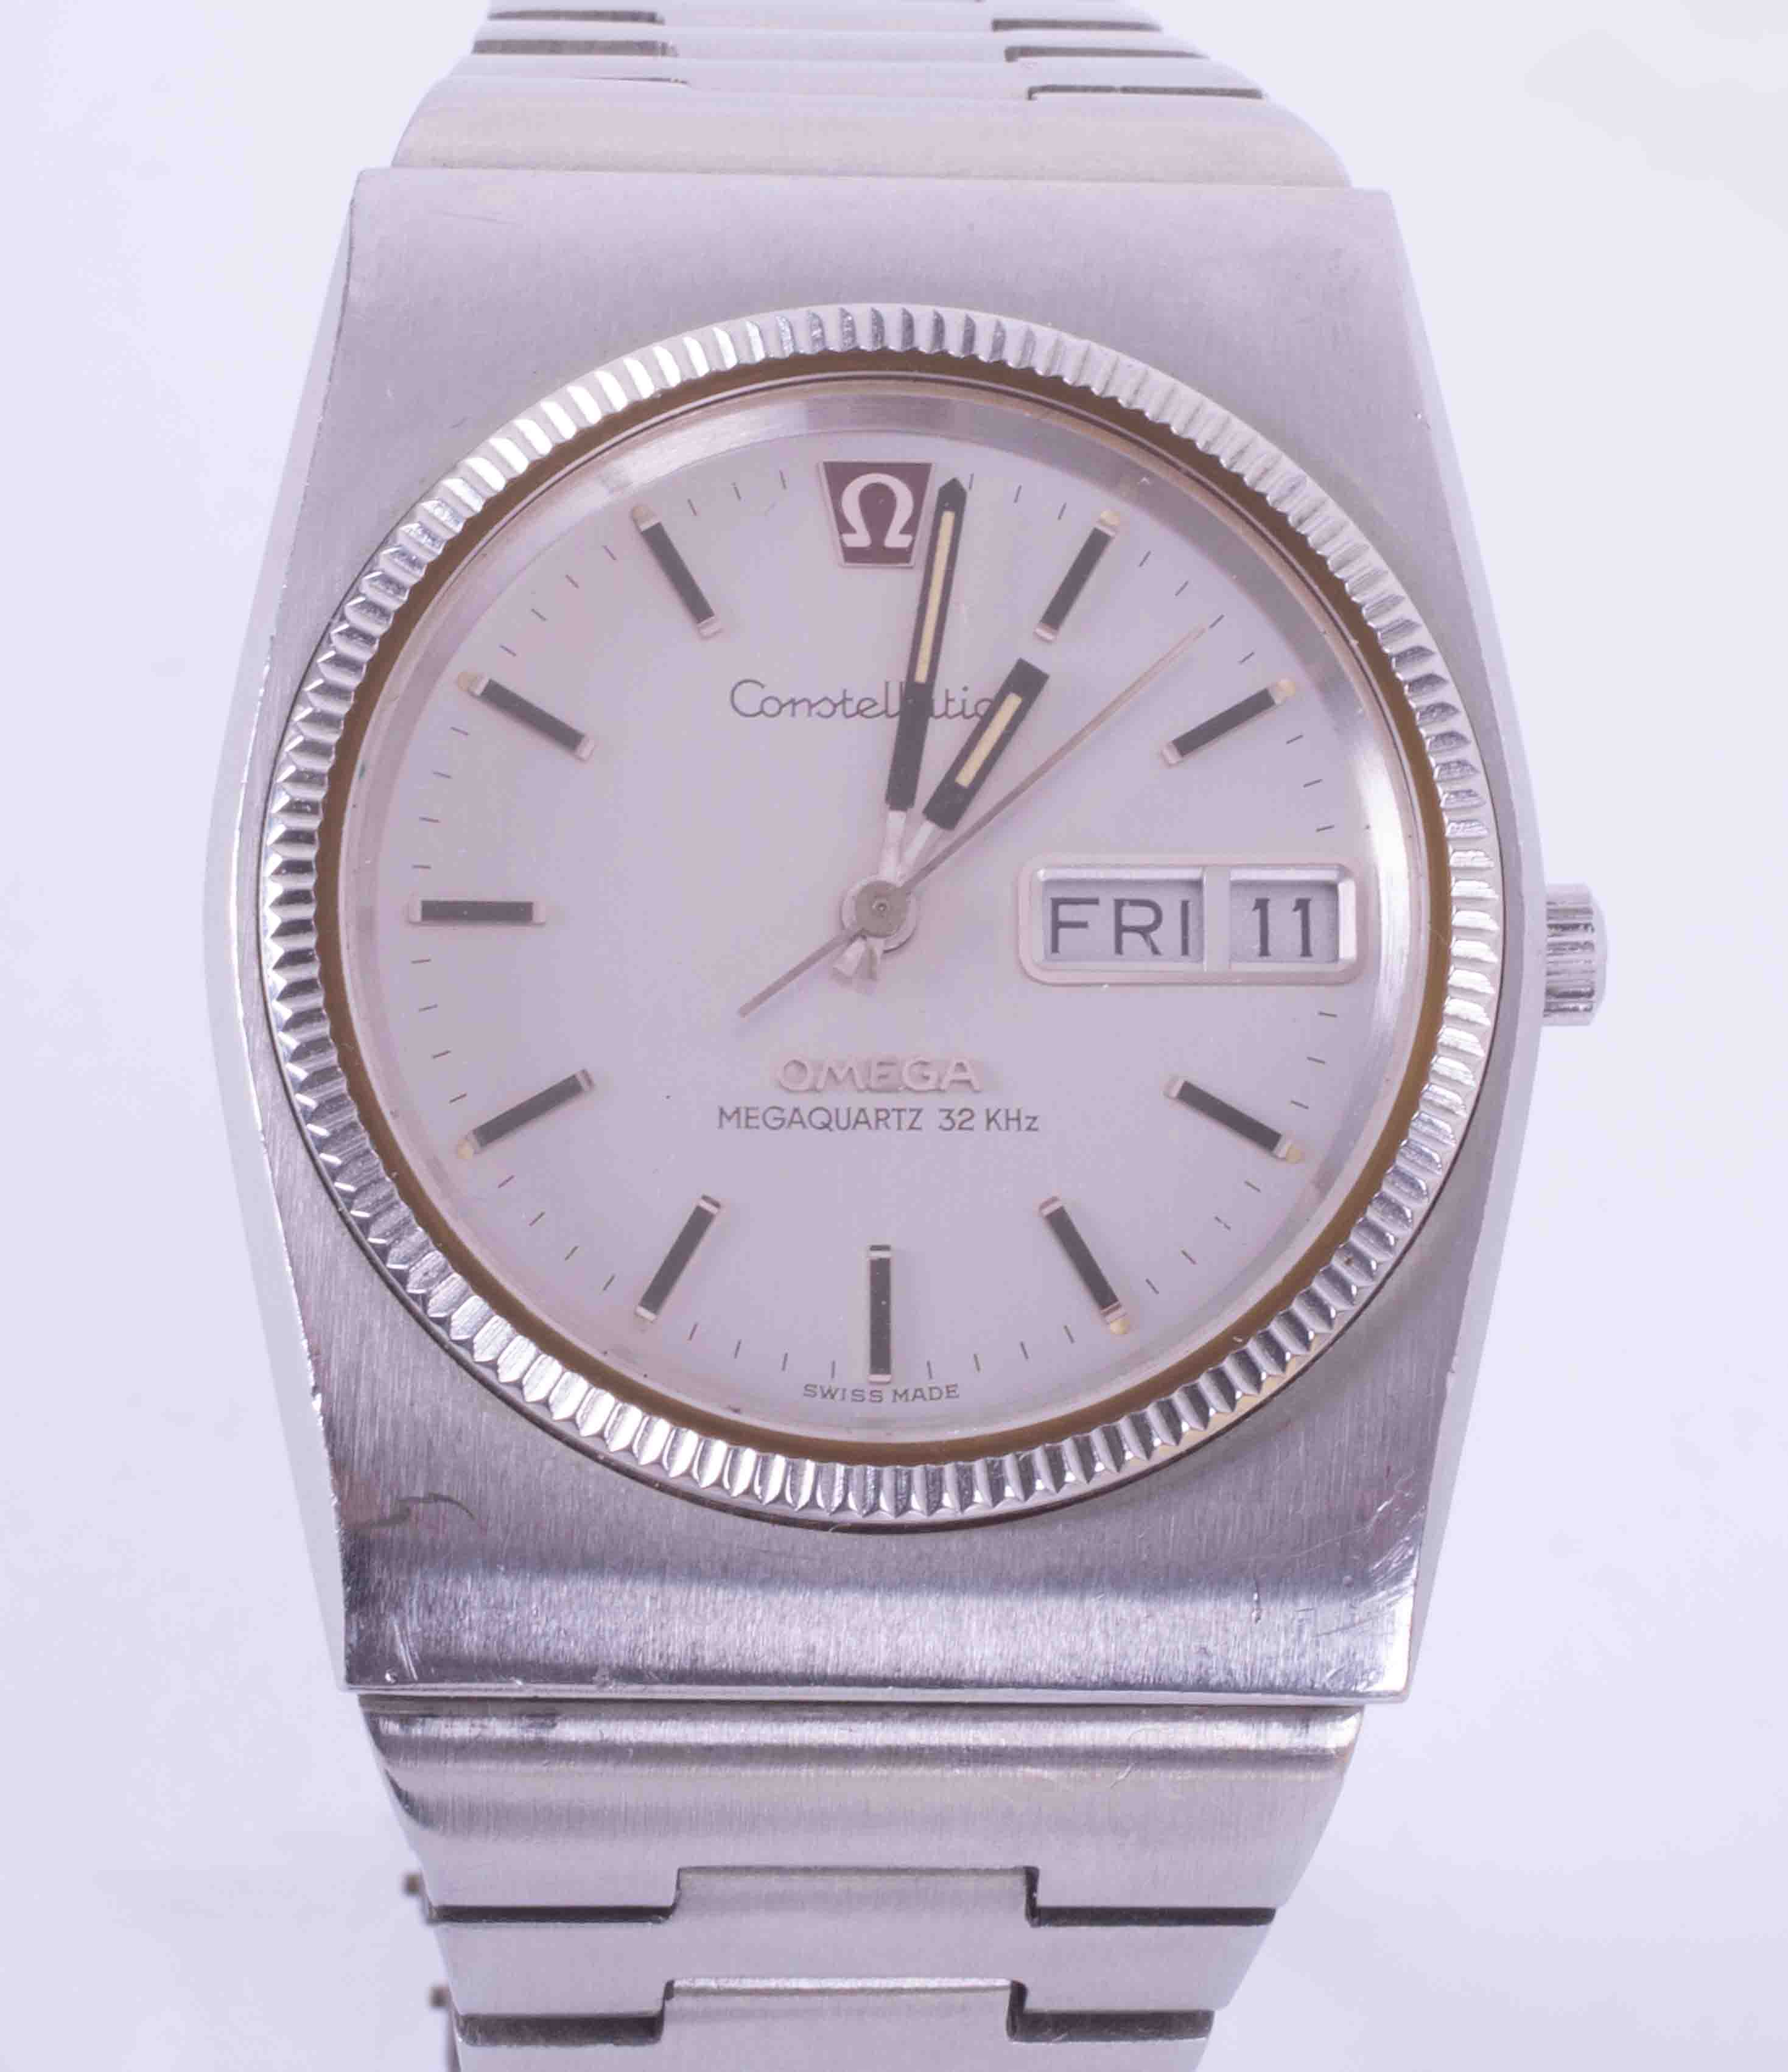 Omega, a gents stainless steel Constellation wristwatch, mega quartz, 196.0030, with original box,